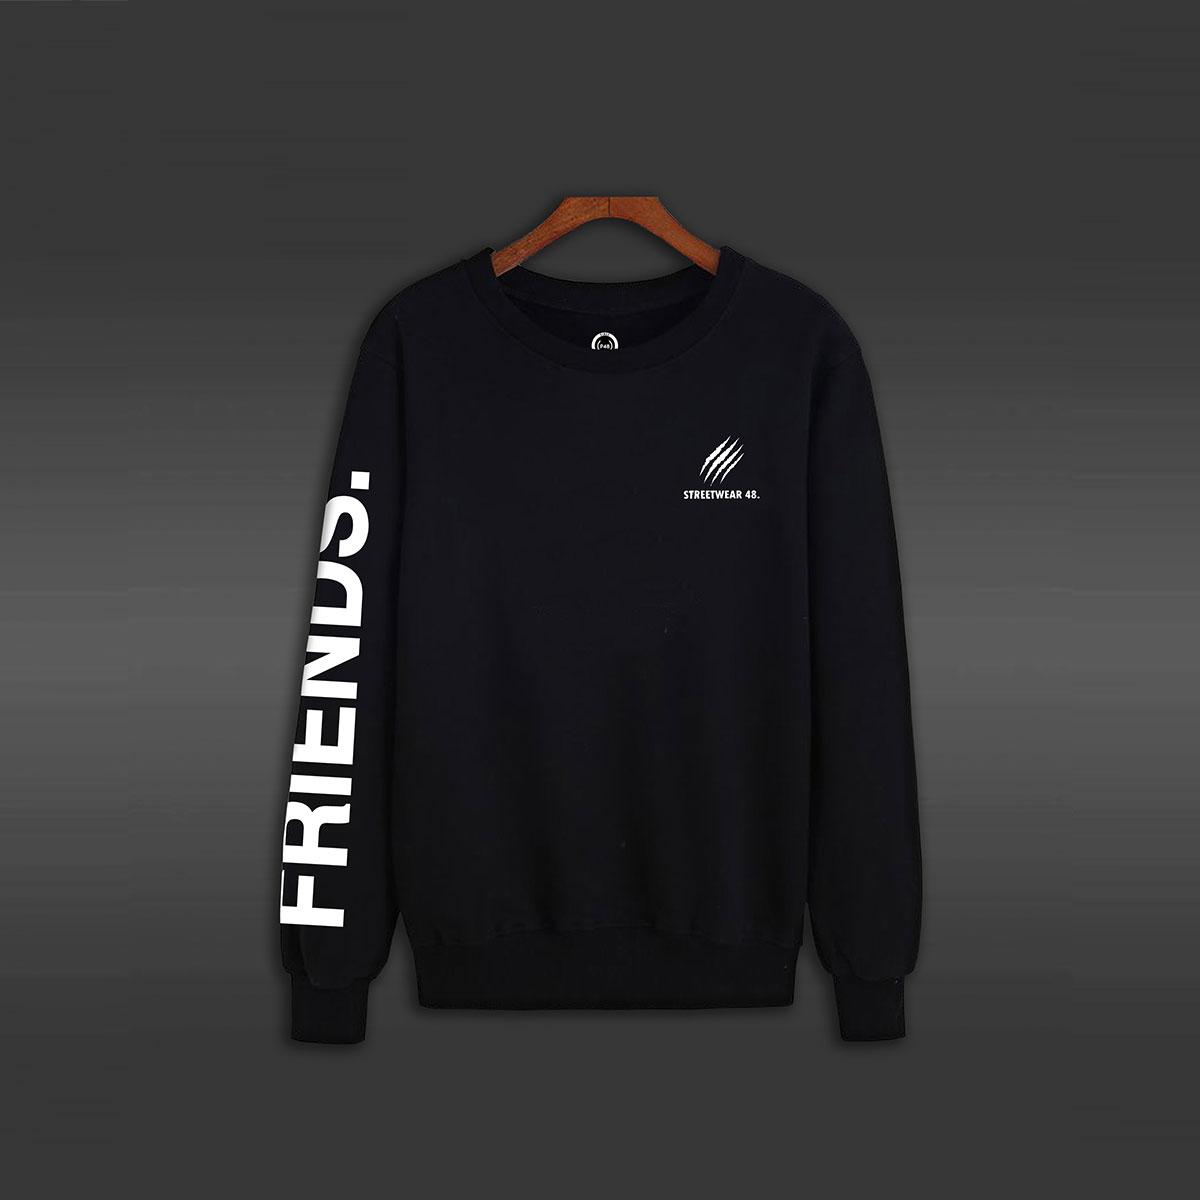 Friends Crew Neck Sweater - Black